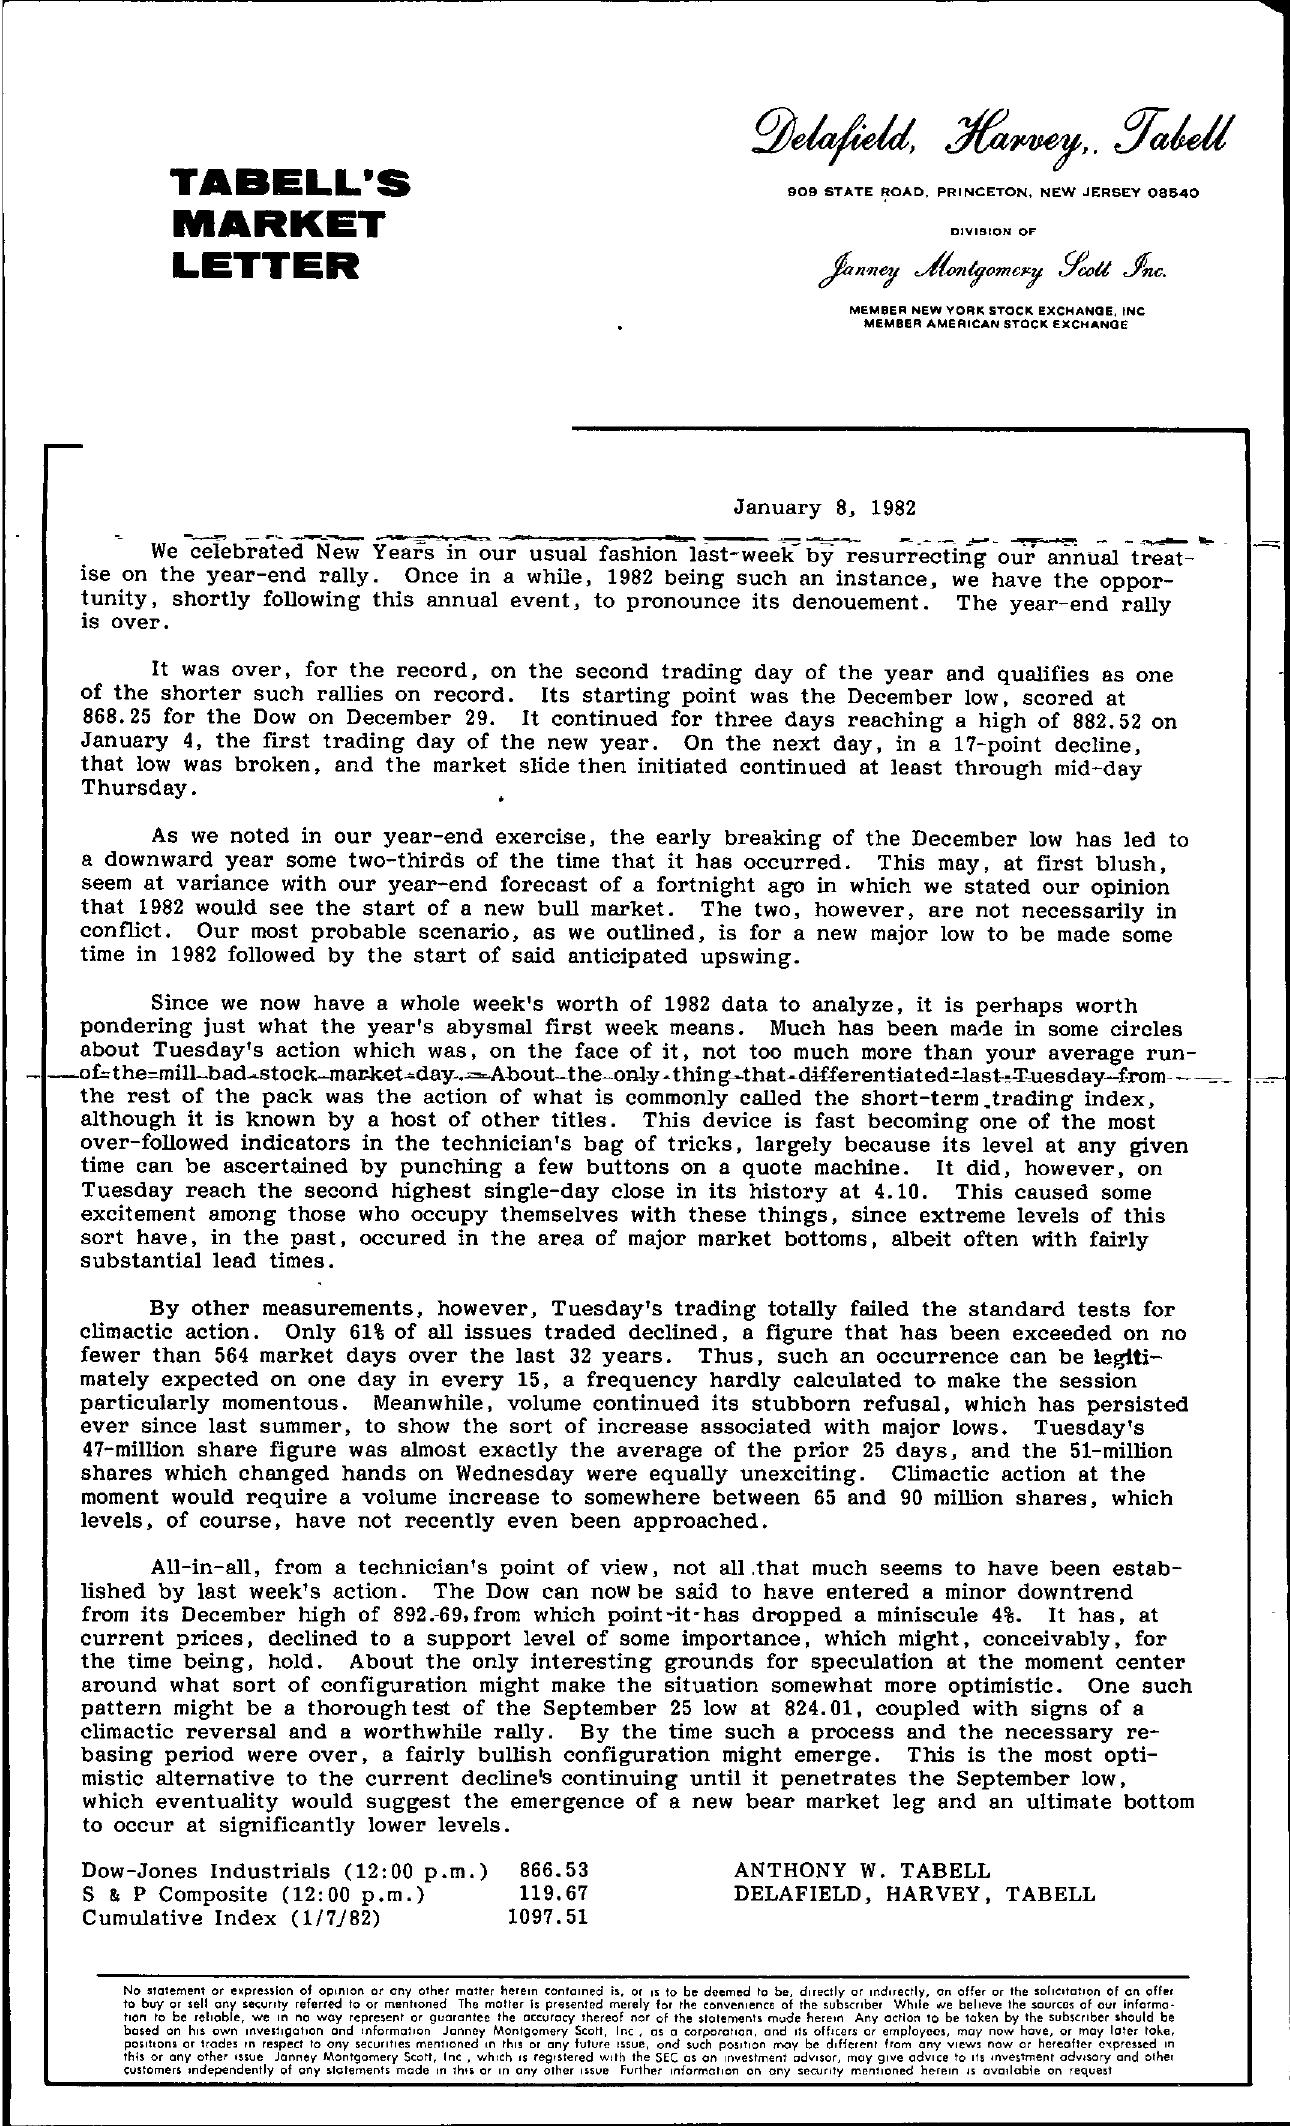 Tabell's Market Letter - January 08, 1982